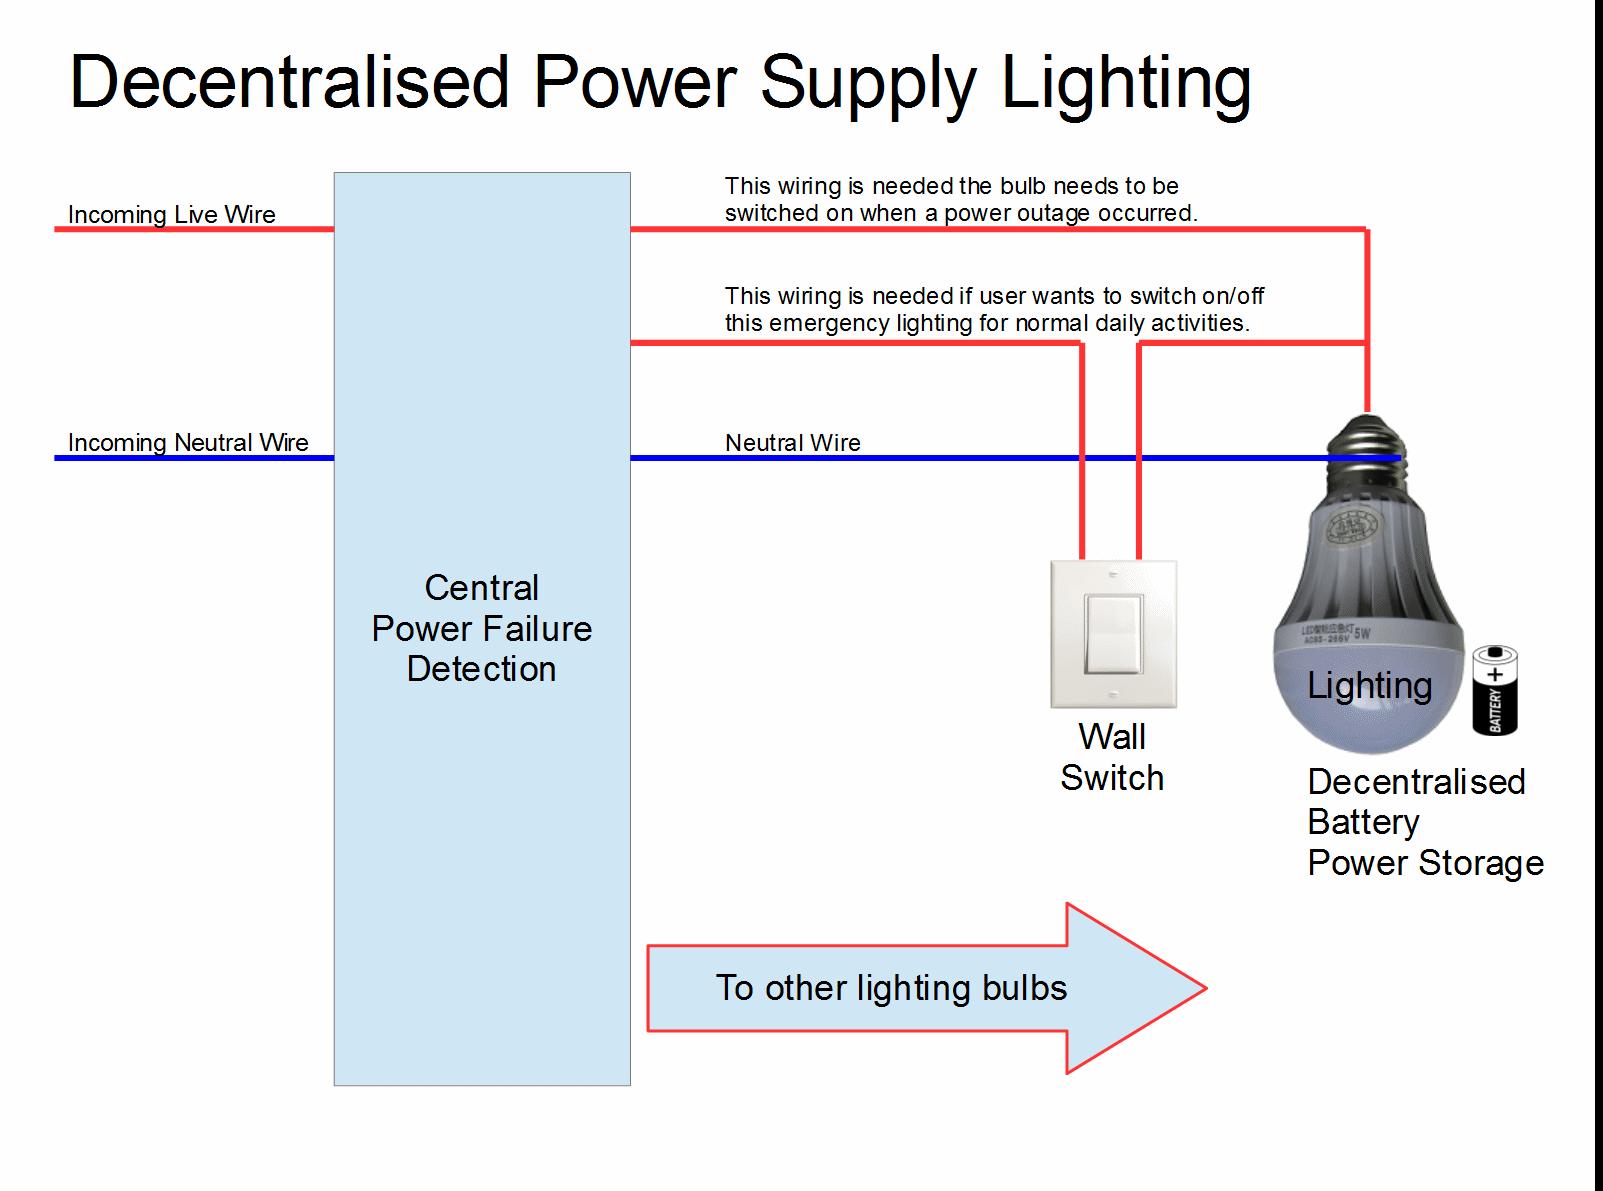 Decentralised Power Supply System for Emergency Lighting